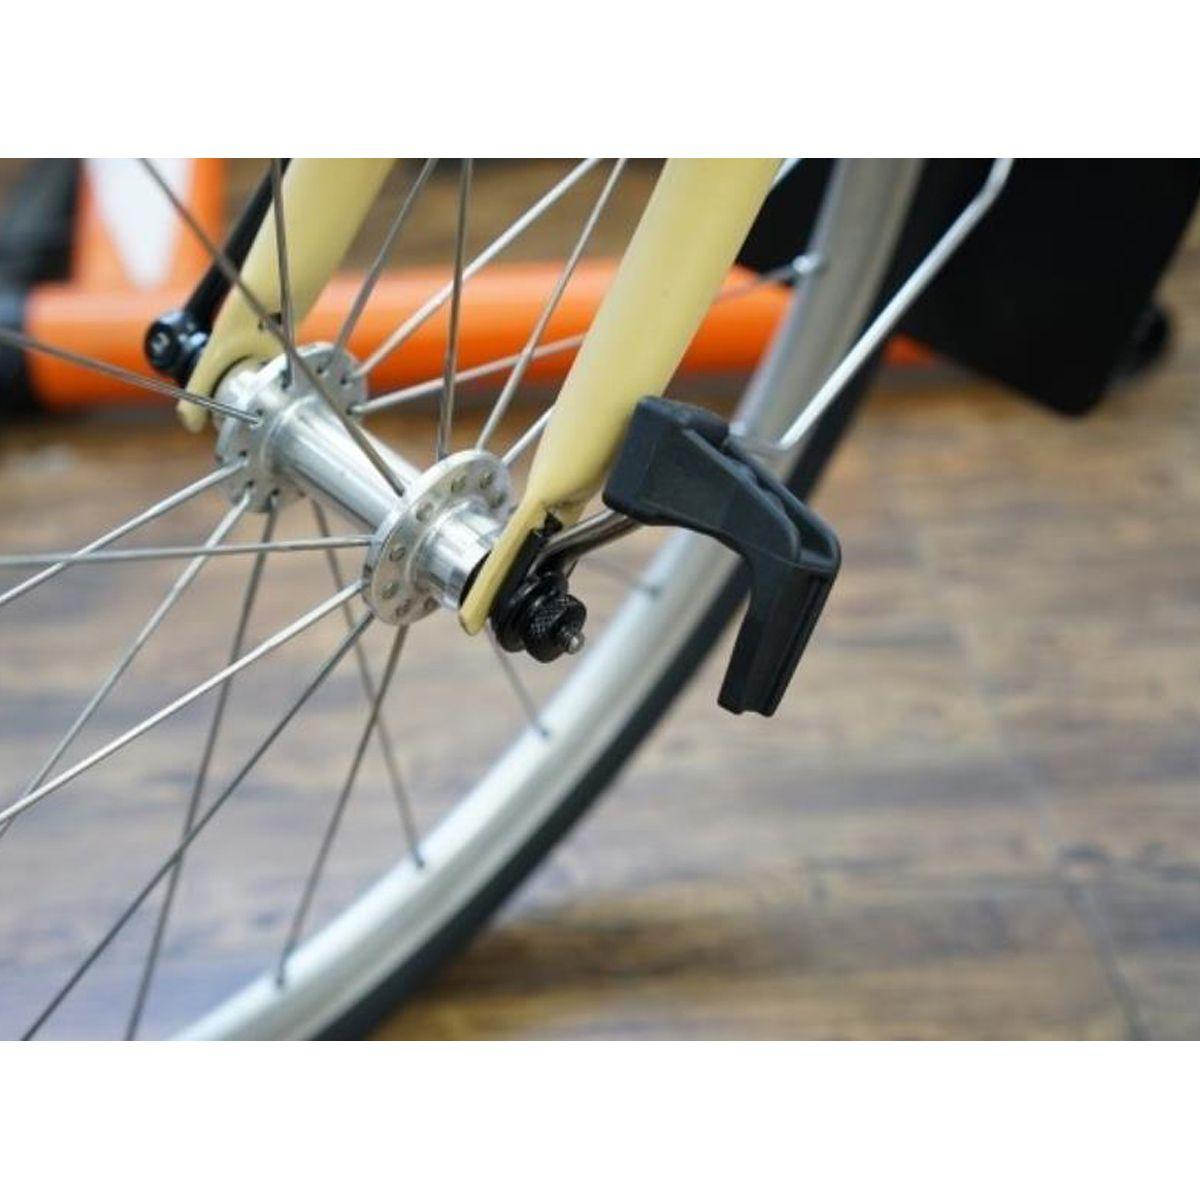 Nov Hook Unit For Front Hub Black Brompton Bicycle Black The Unit